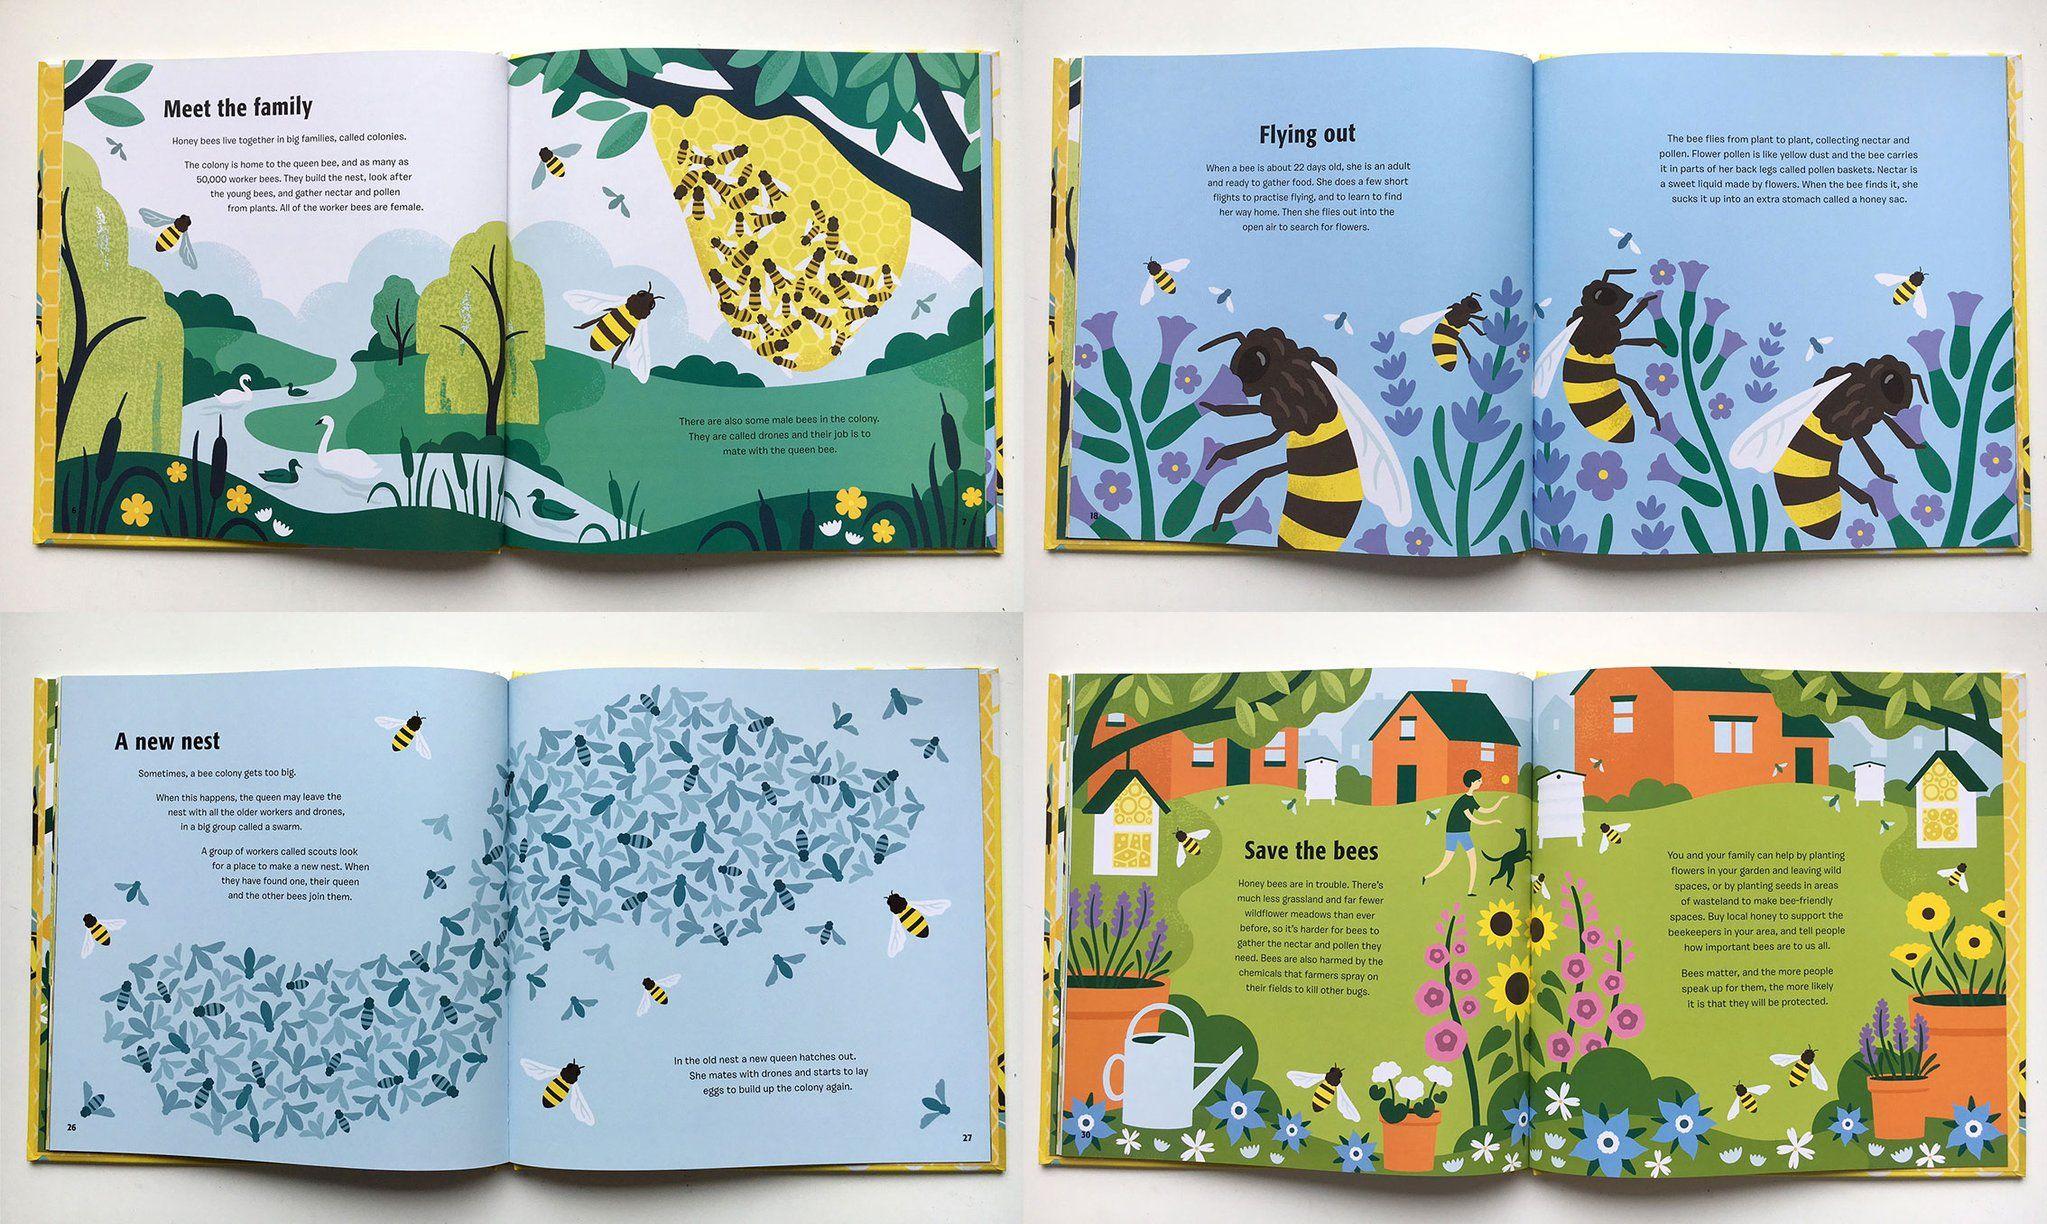 Children Book Illustrations Breathtaking Examples For Inspiration Book Illustration Layout Book Illustration Art Book Illustration